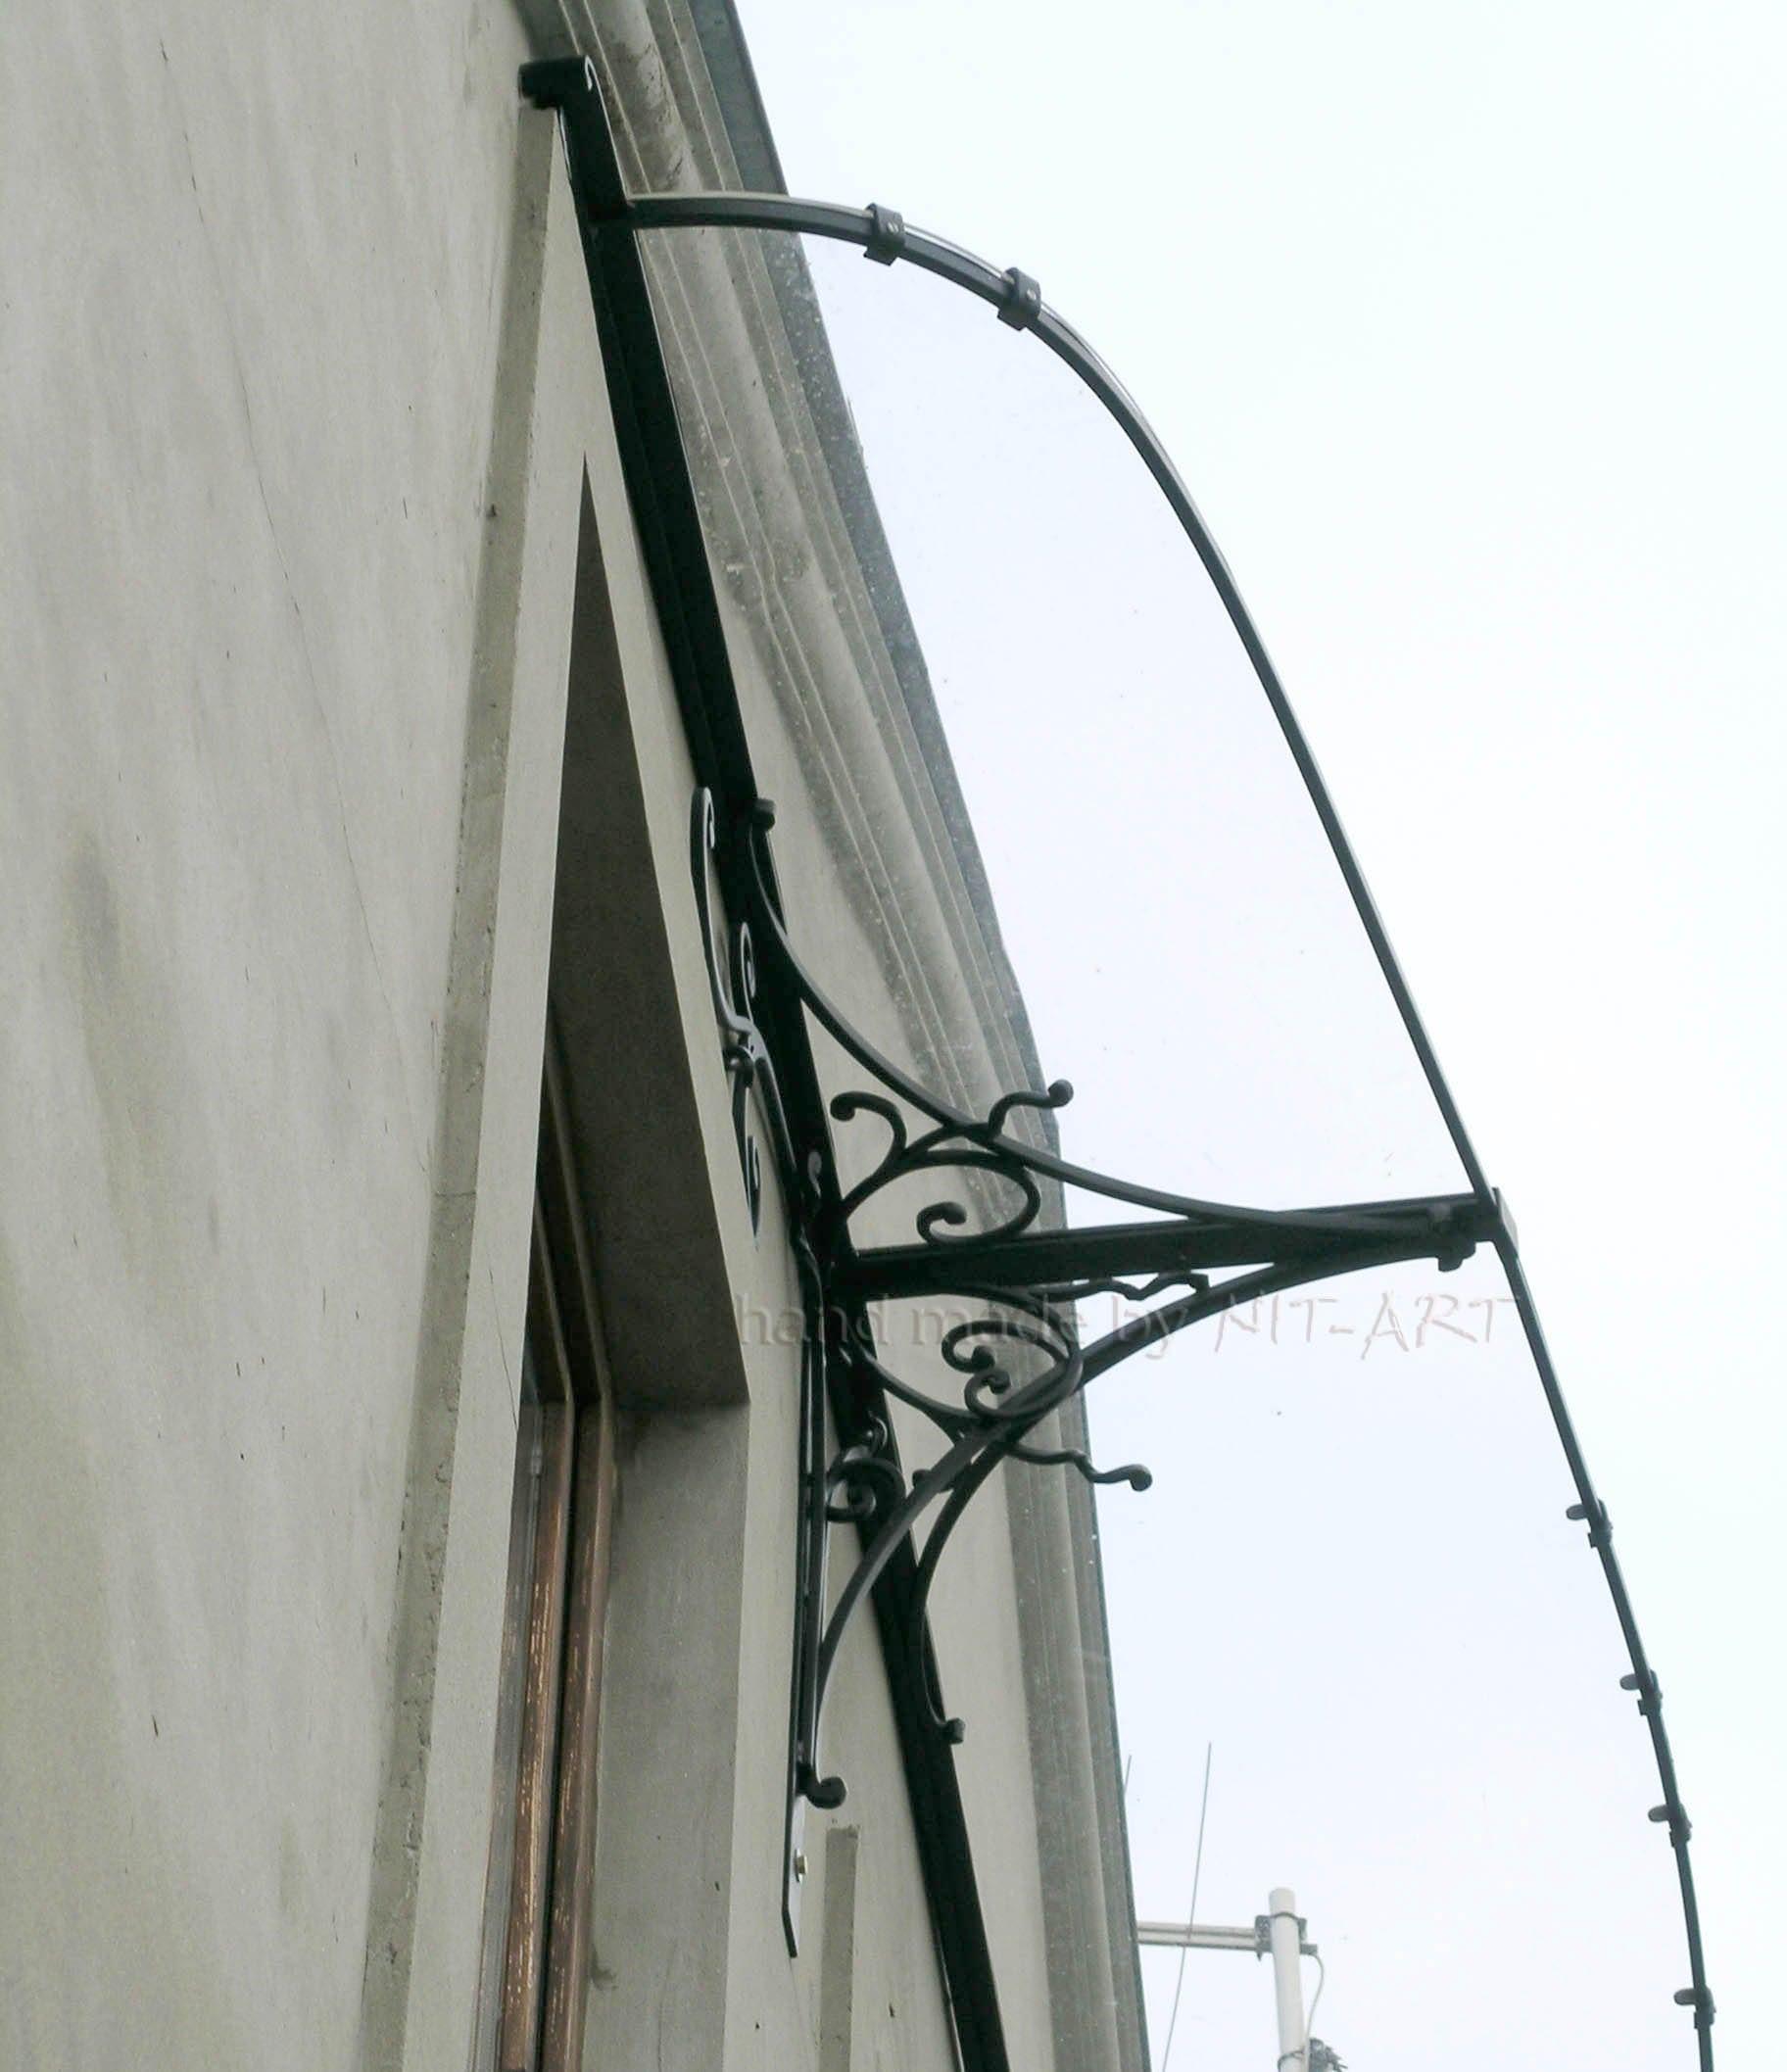 NIT-ART Kovano gvozdje nadstresnice